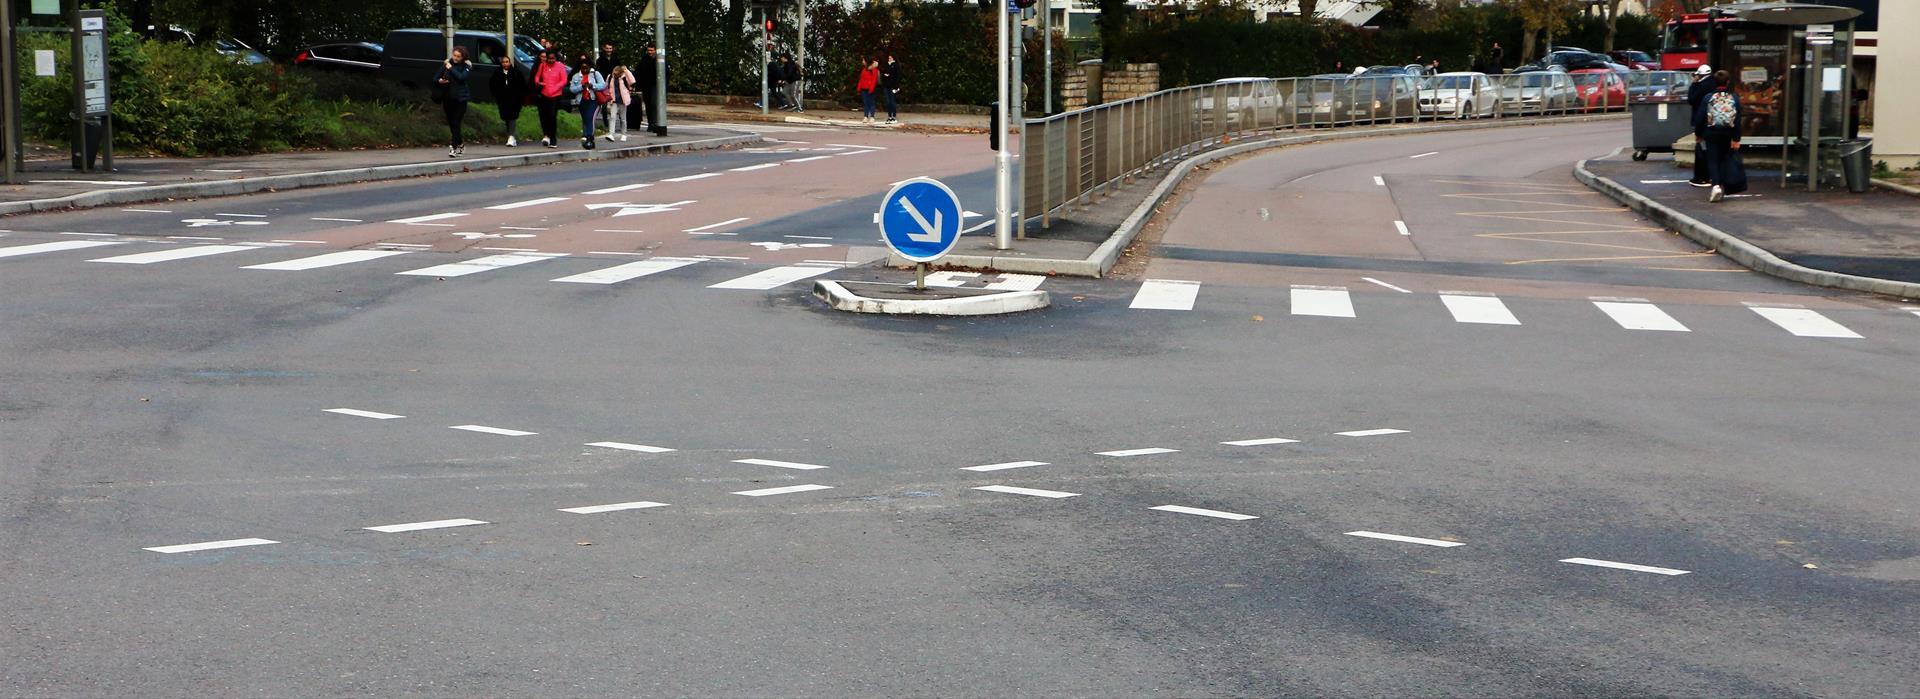 carrefour Pompon Allobroges (1)